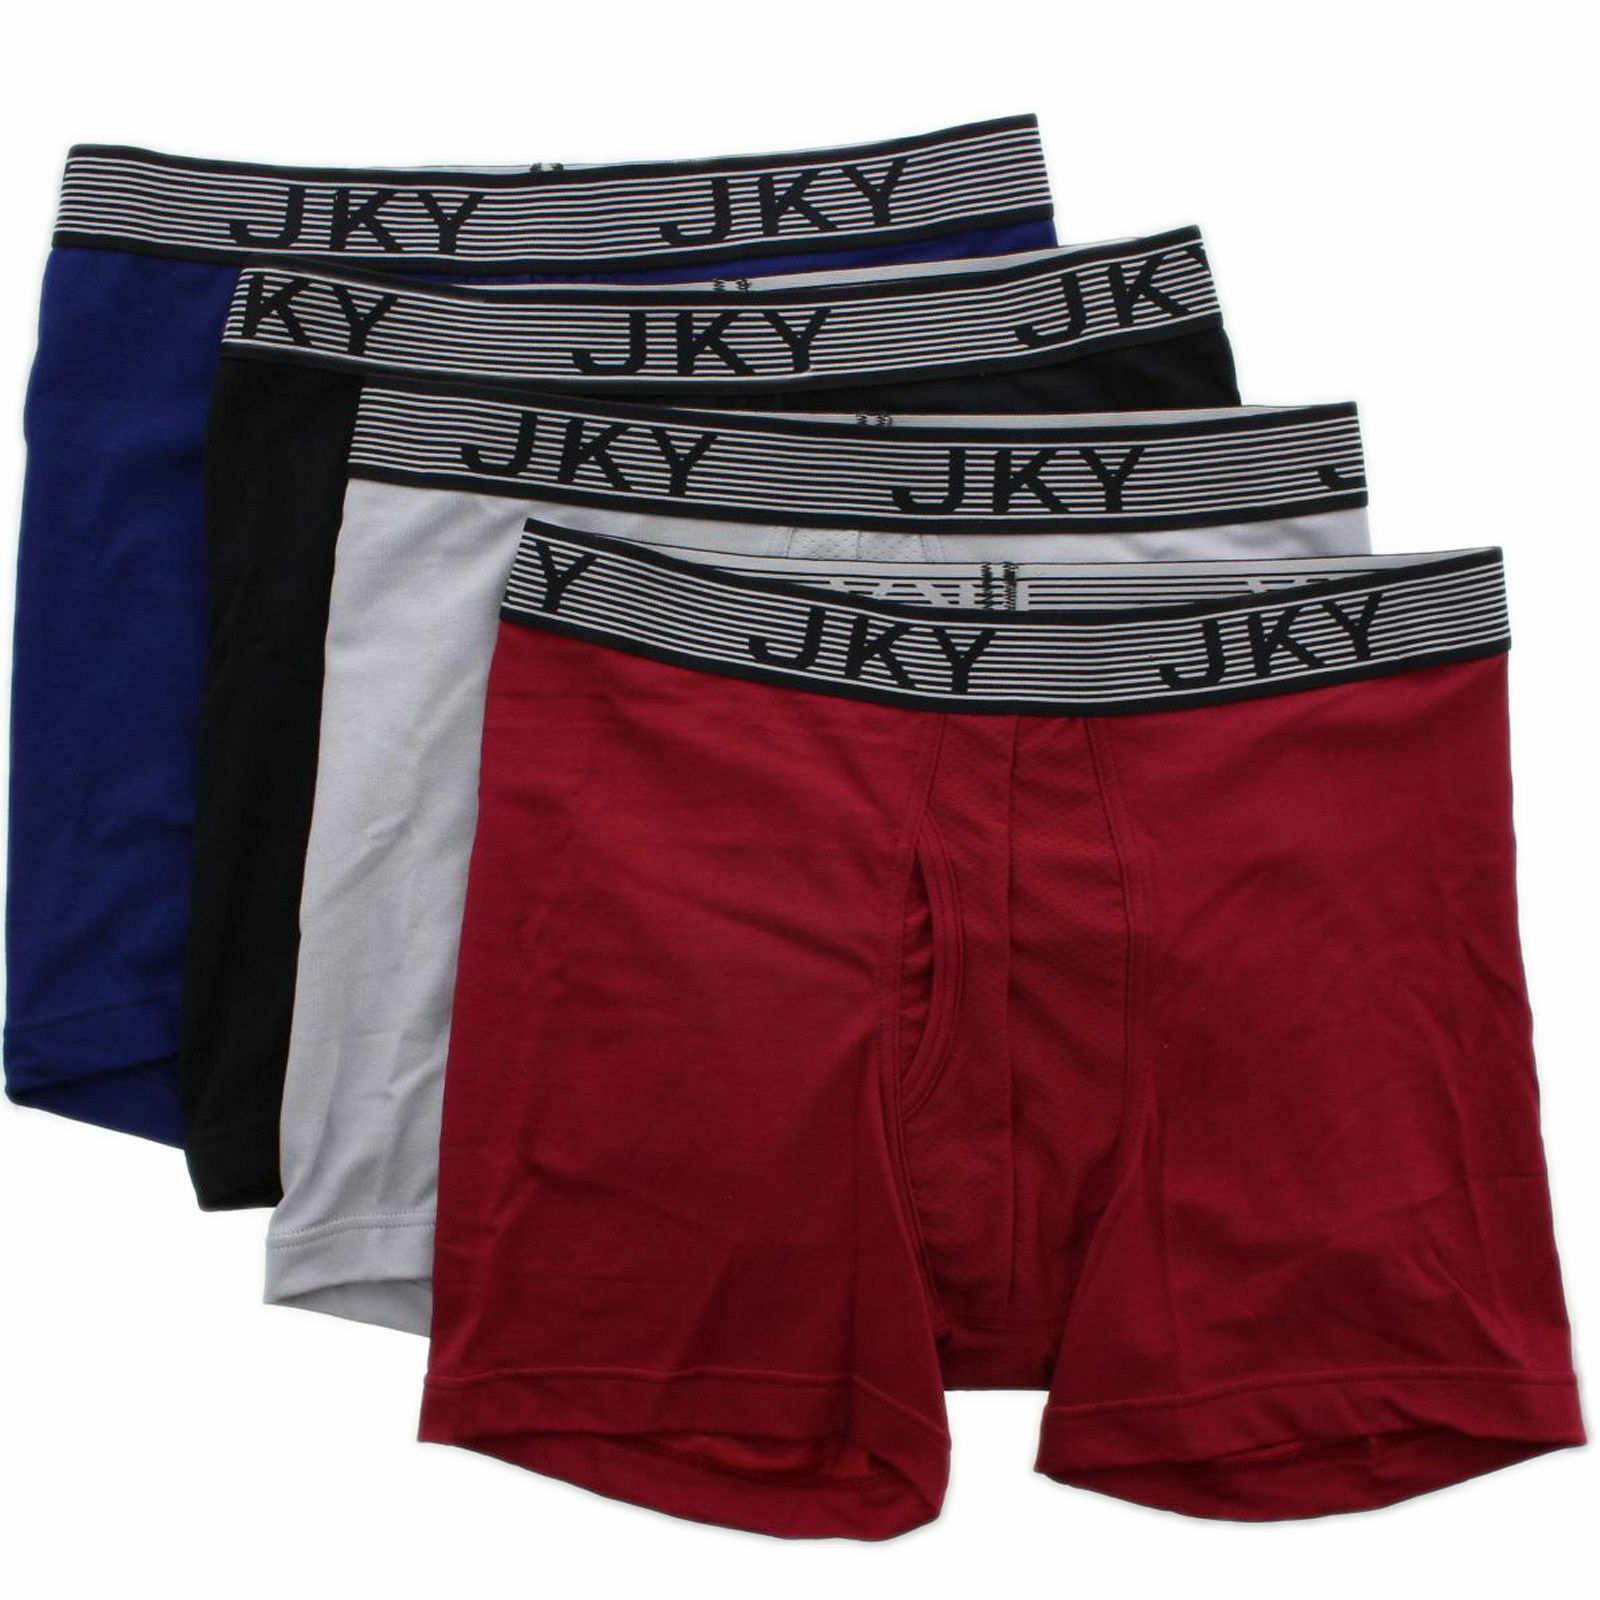 JKY by Jockey Mens Athletic Sport Performance Microfiber Box